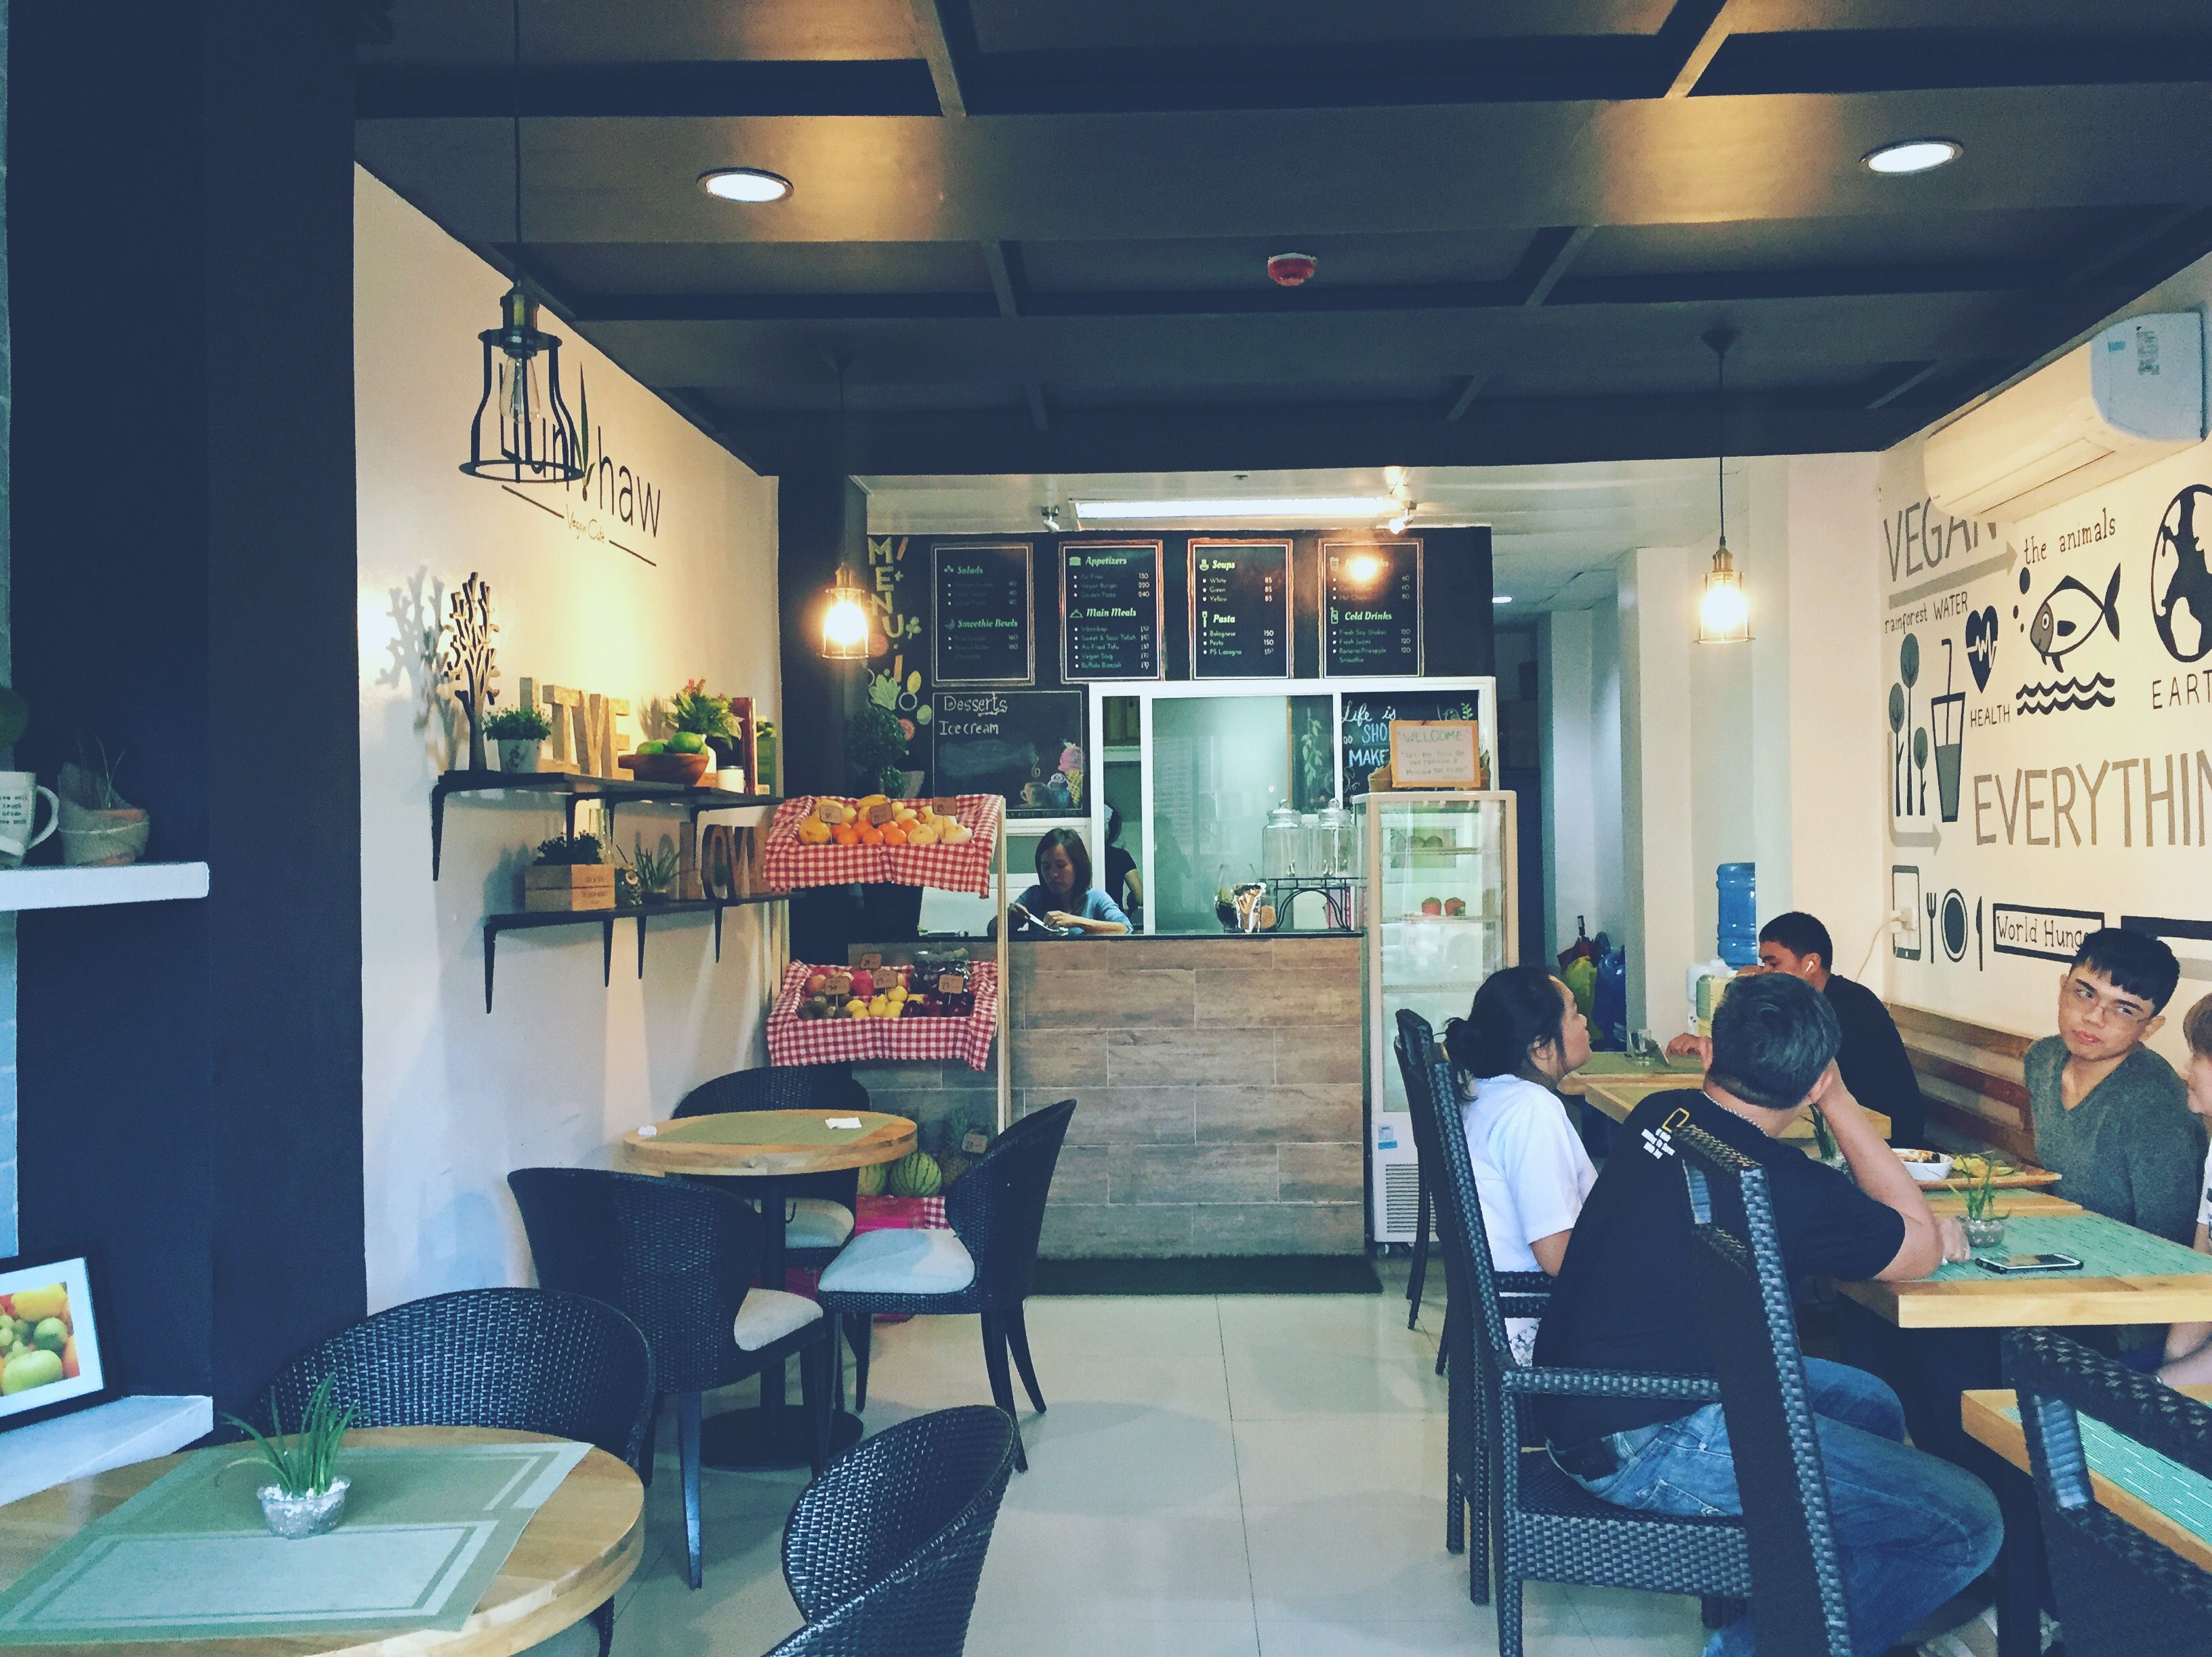 Lun haw Vegan Cafe店内